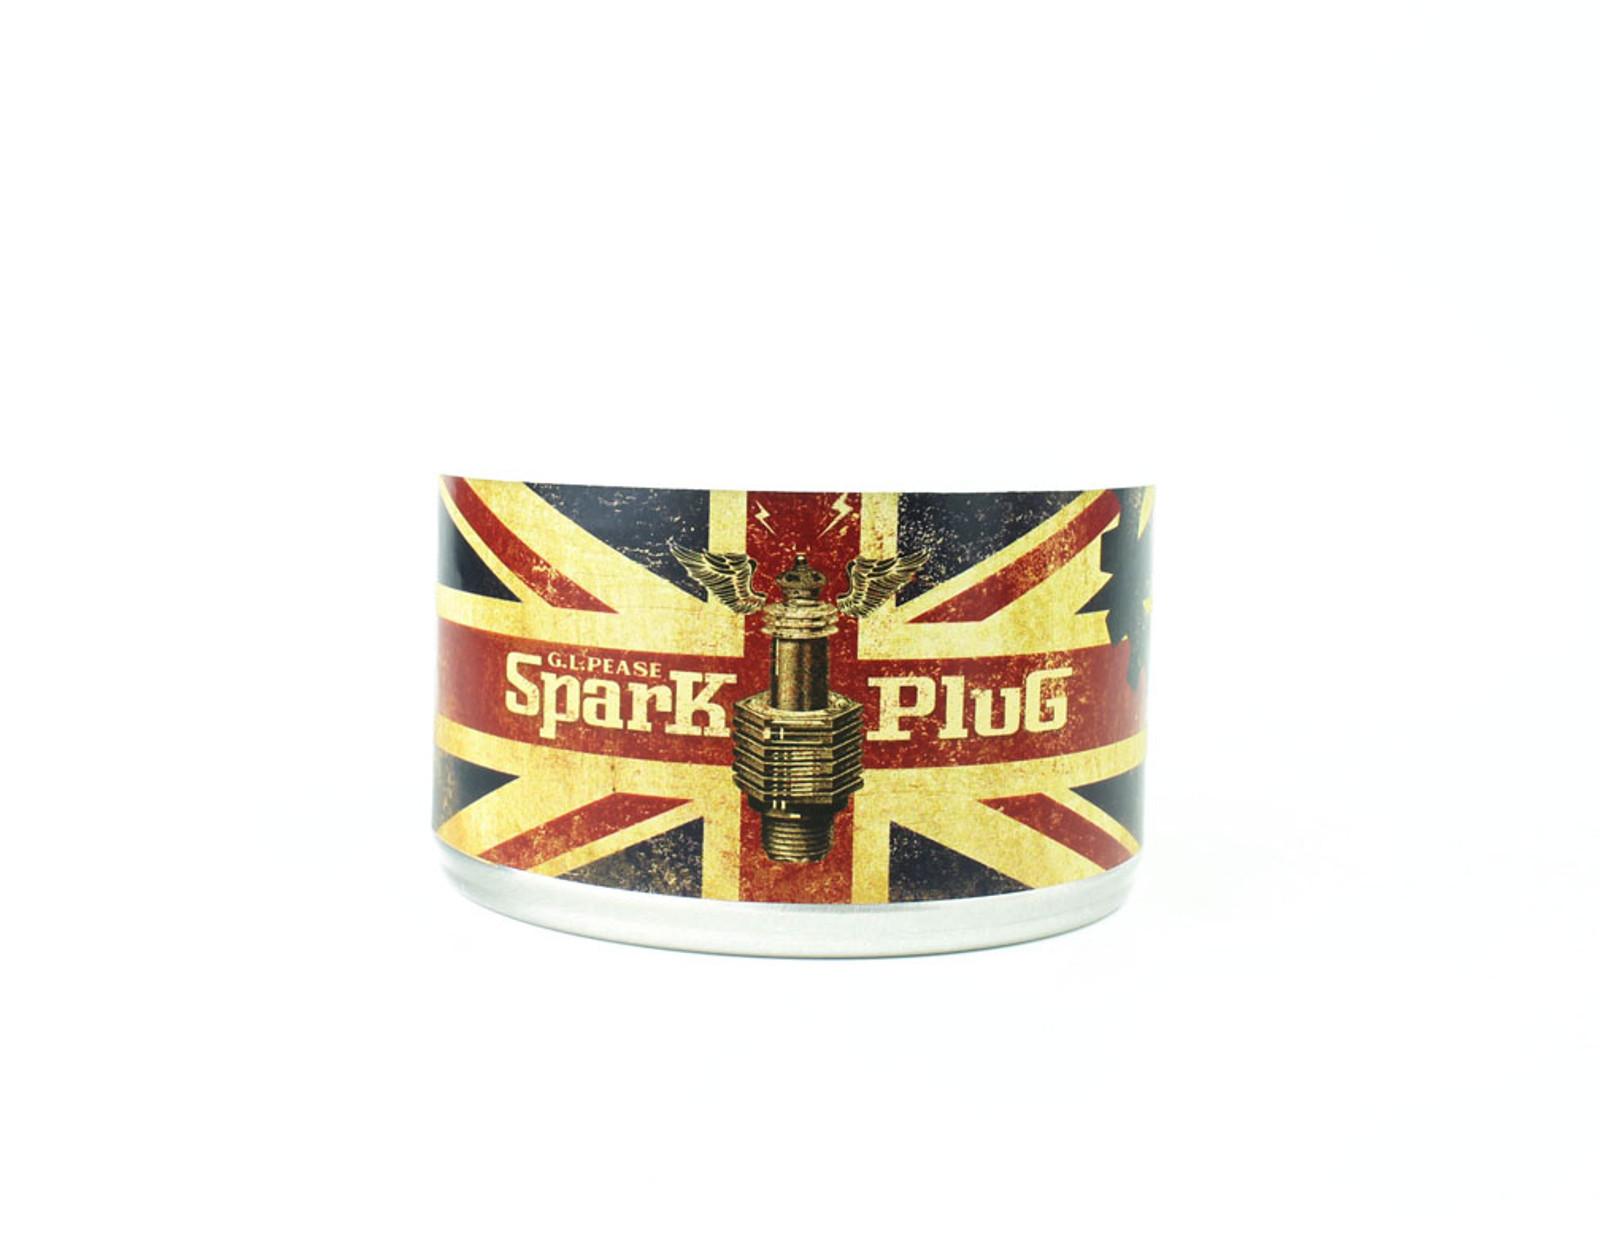 G.L. Pease Sparkplug (2oz tin)